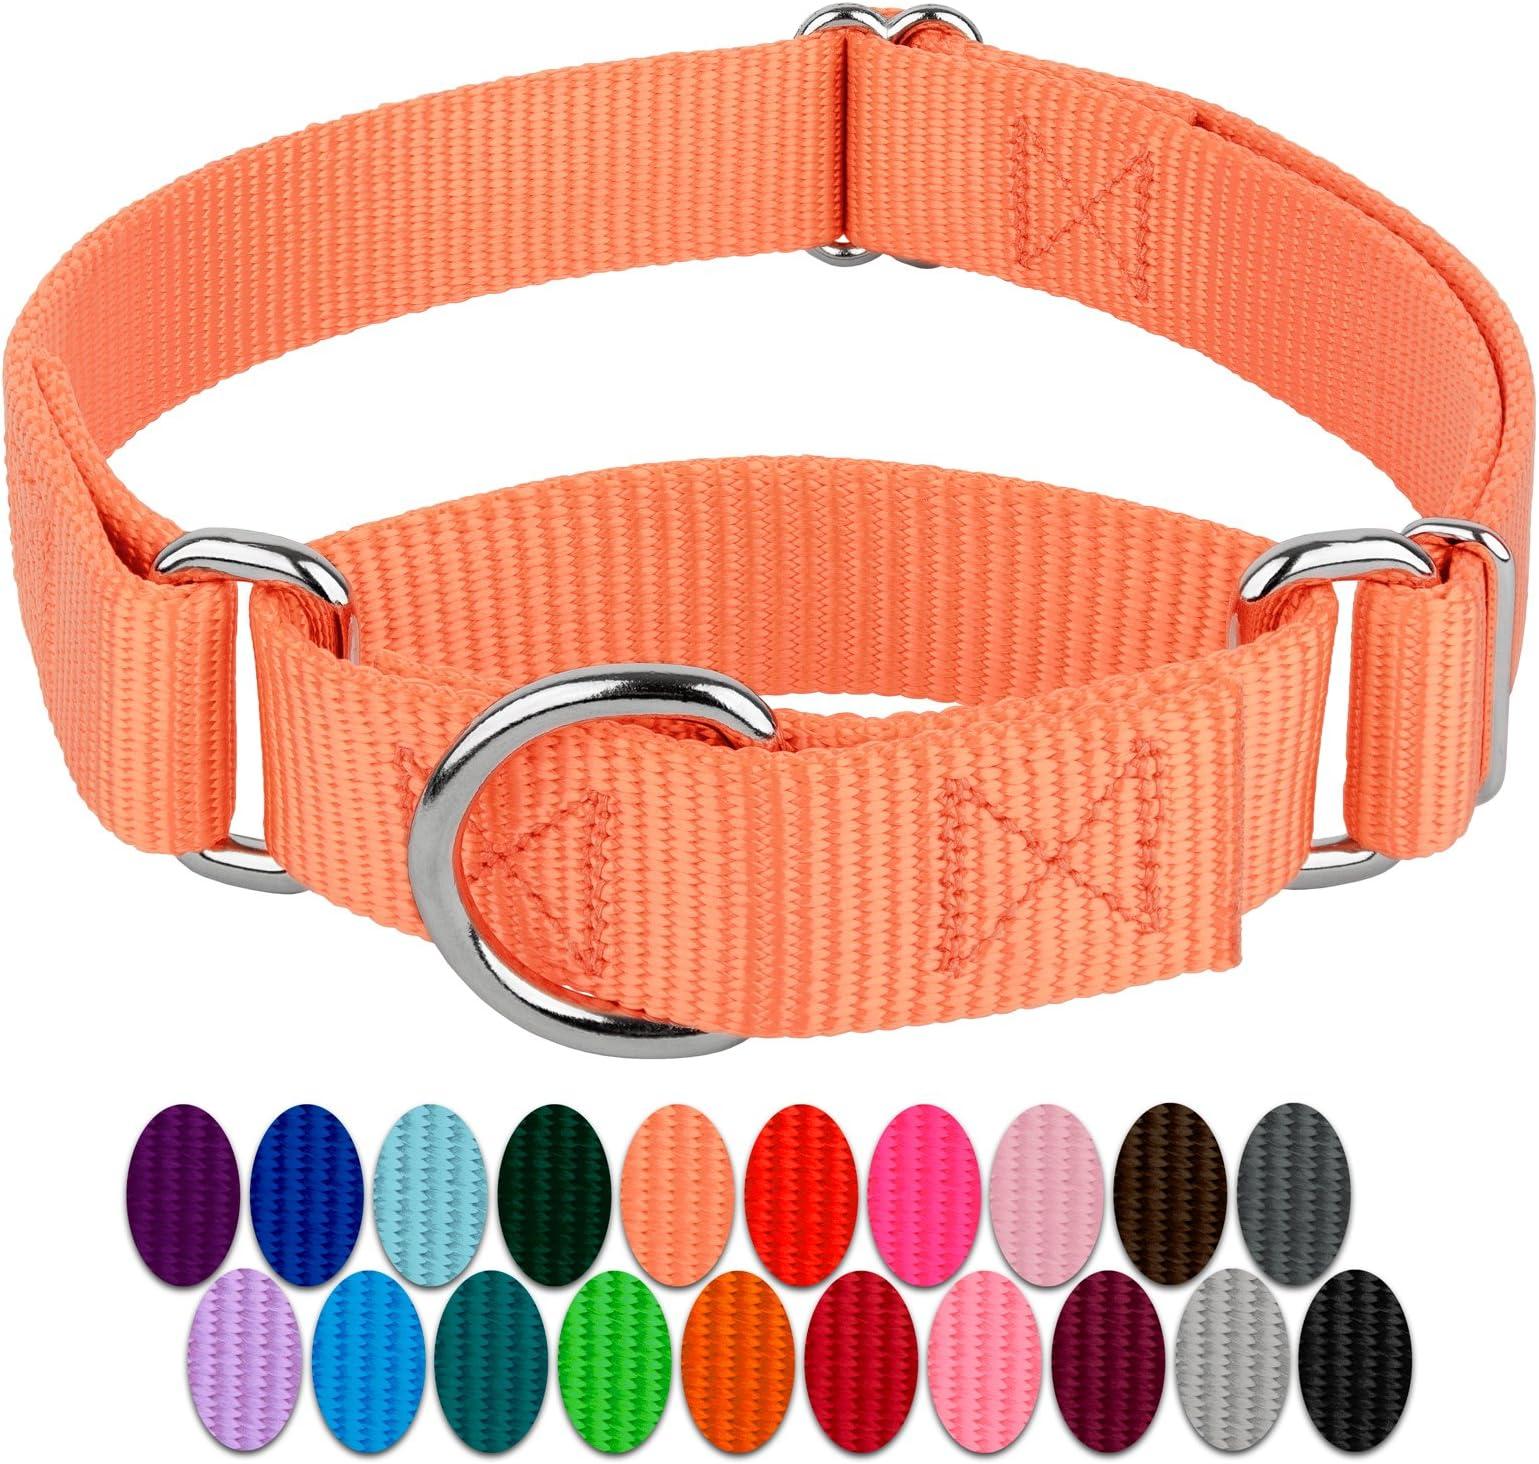 dog collar and lead set teal 2 inch dog collar whippet collar mermaid dog collar  scales sighthound collar fabric dog collar bundle